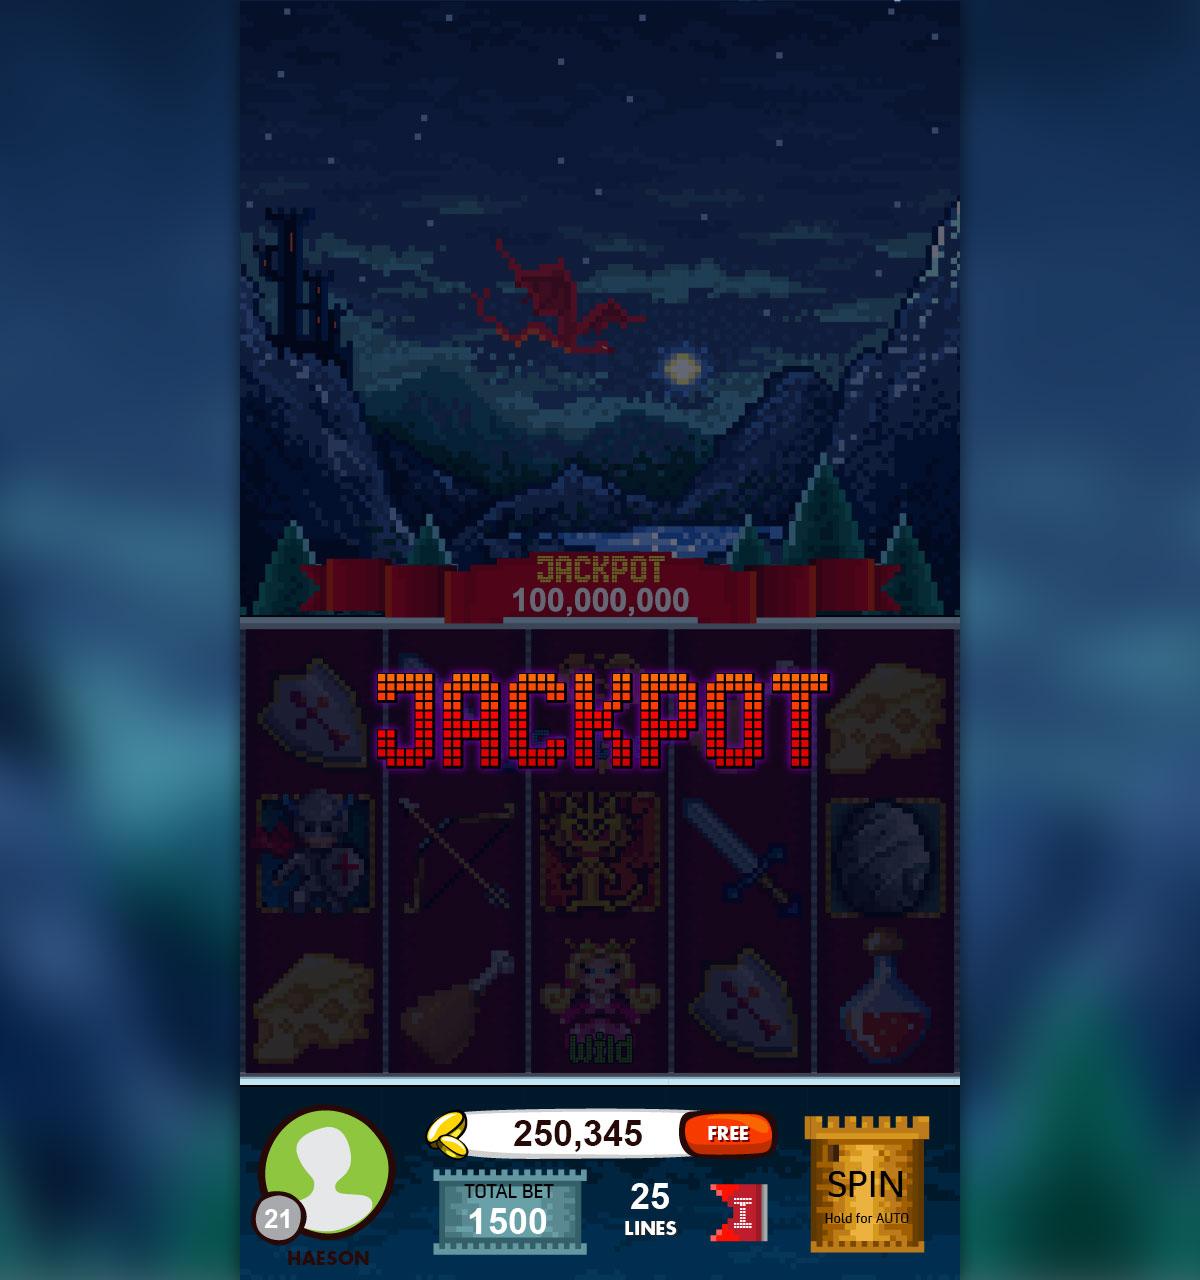 pixel_dungion_blog_jackpot